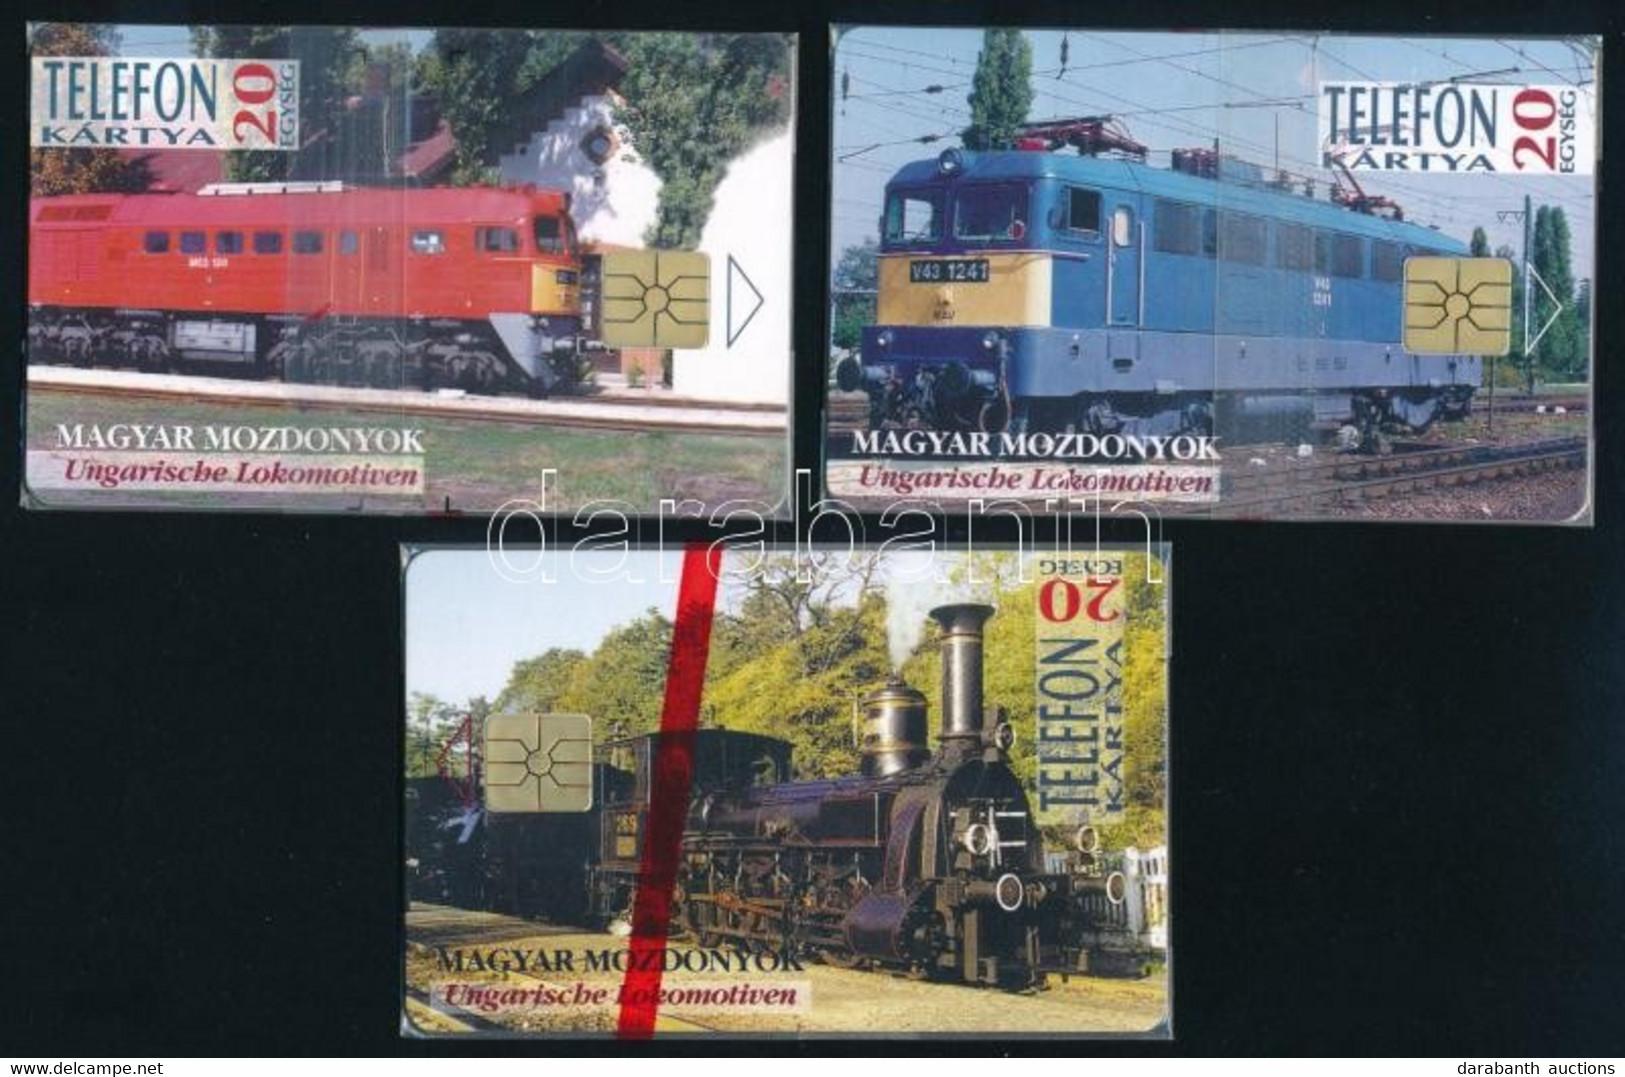 1995 MÁV Vasút Sorozat (gőzmozdony, V43, M62), Bontatlan Csomagolásban - Unclassified